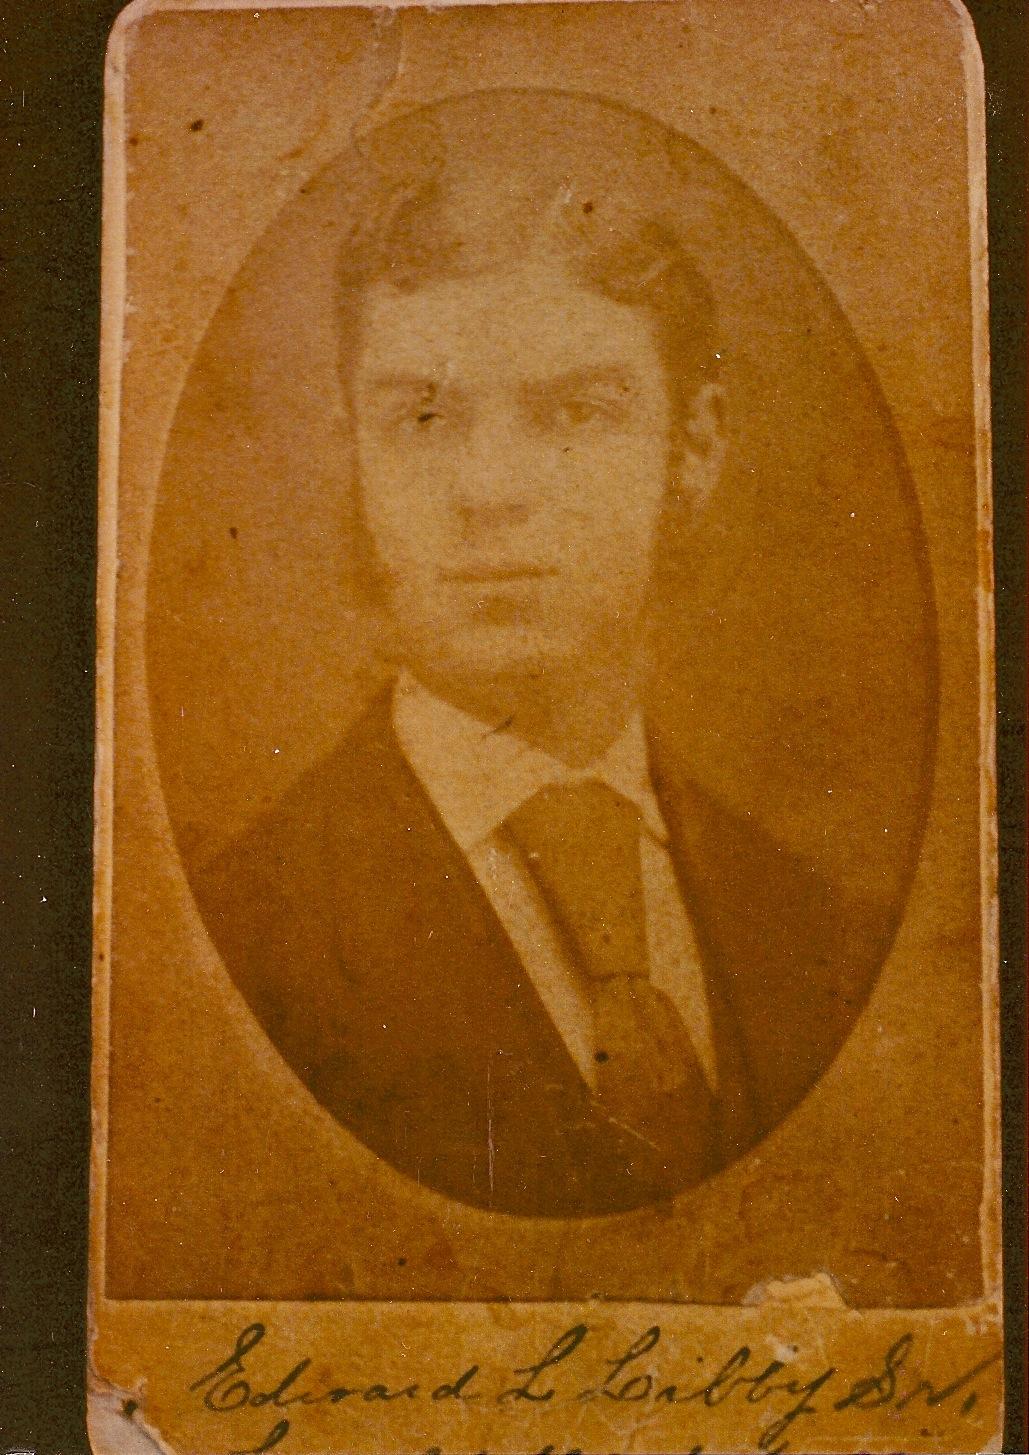 Edward Lewis Libby